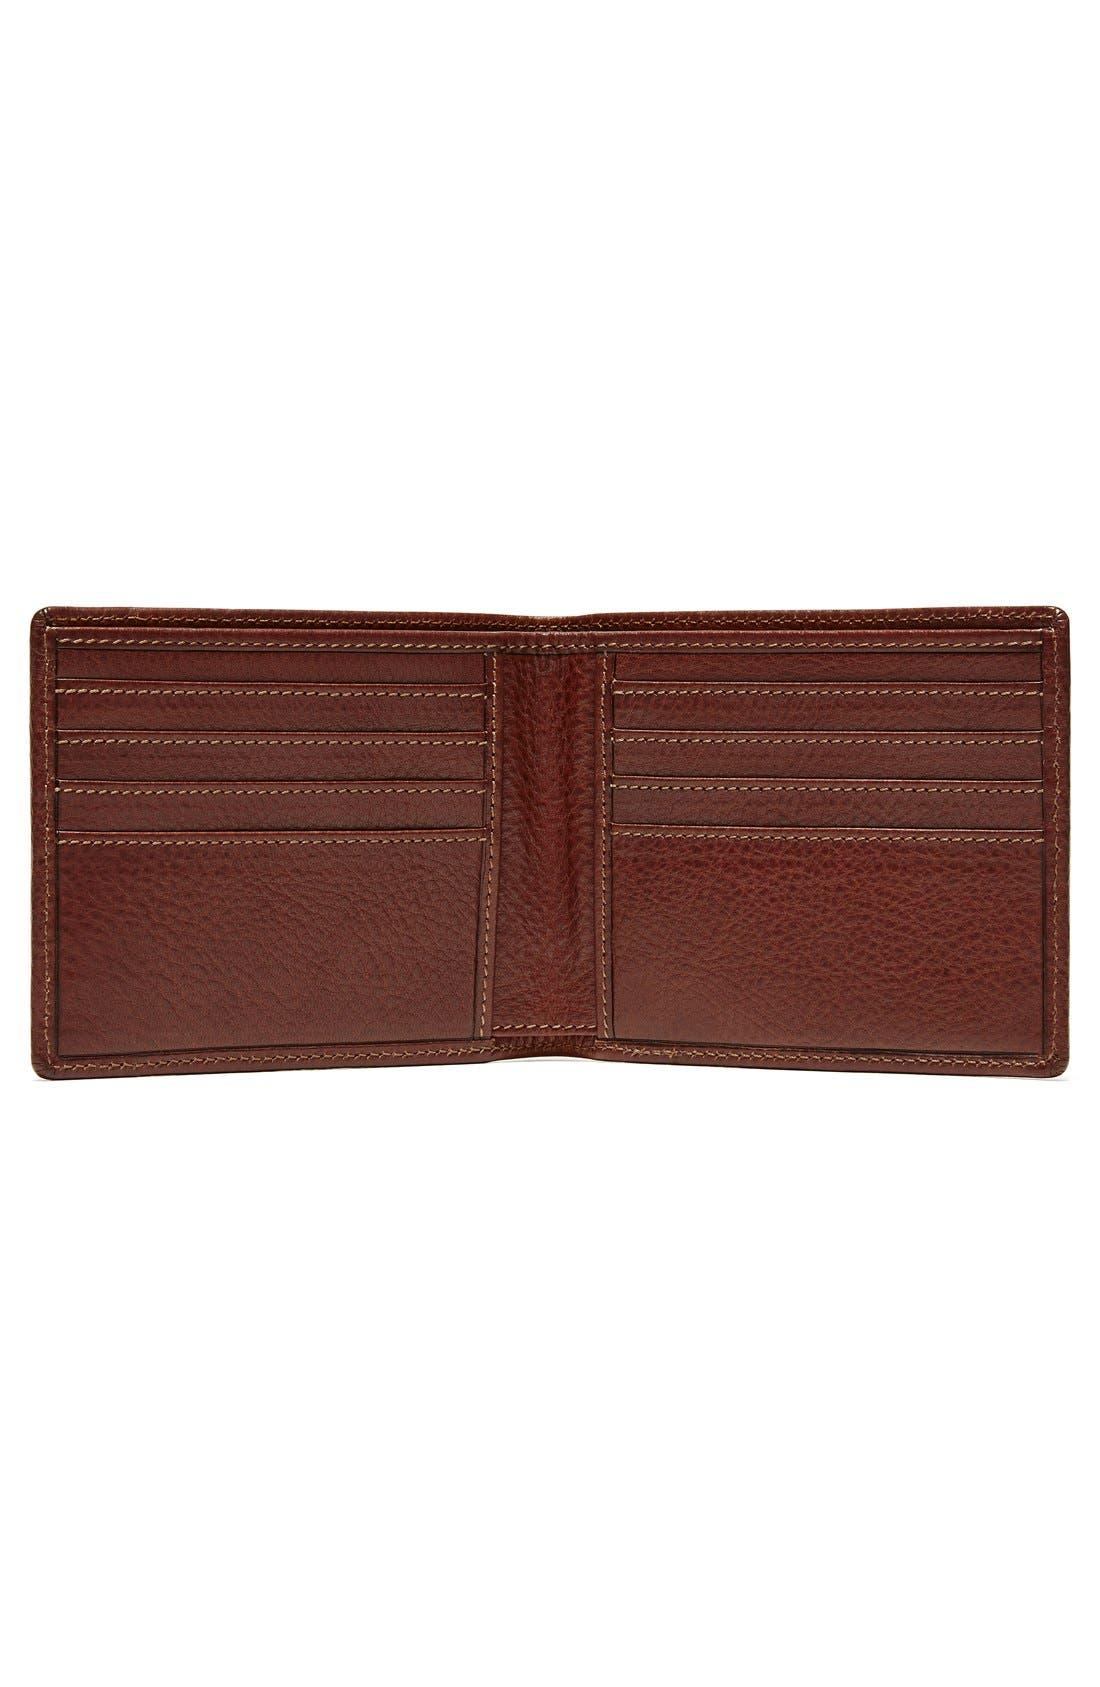 Alternate Image 2  - Ghurka Classic Leather Wallet